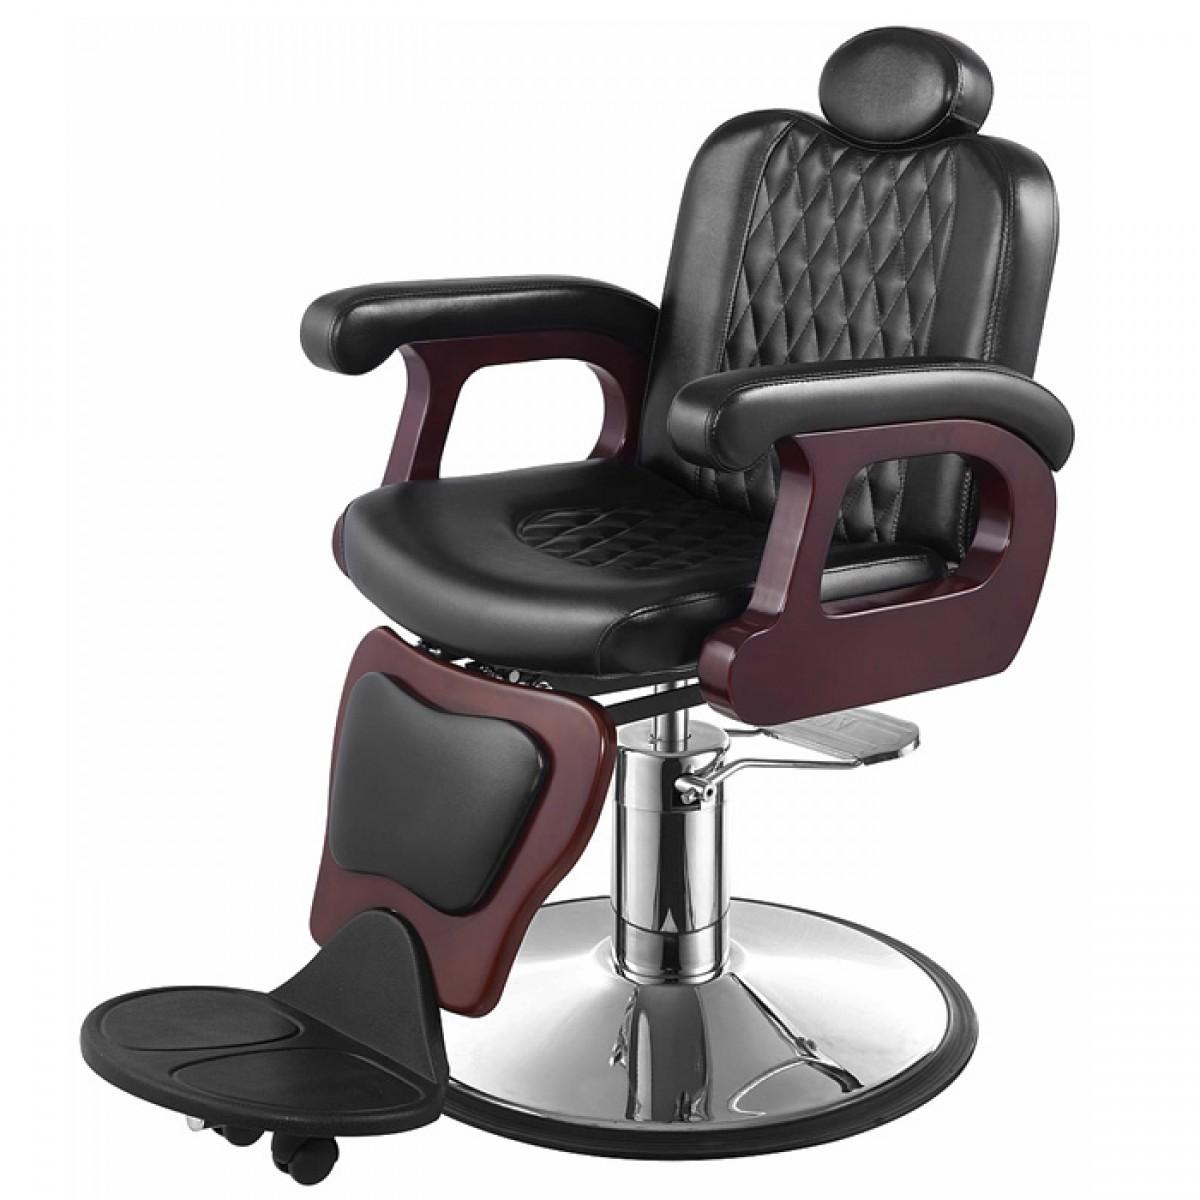 """SENIOR"" Antique Barber Chair"